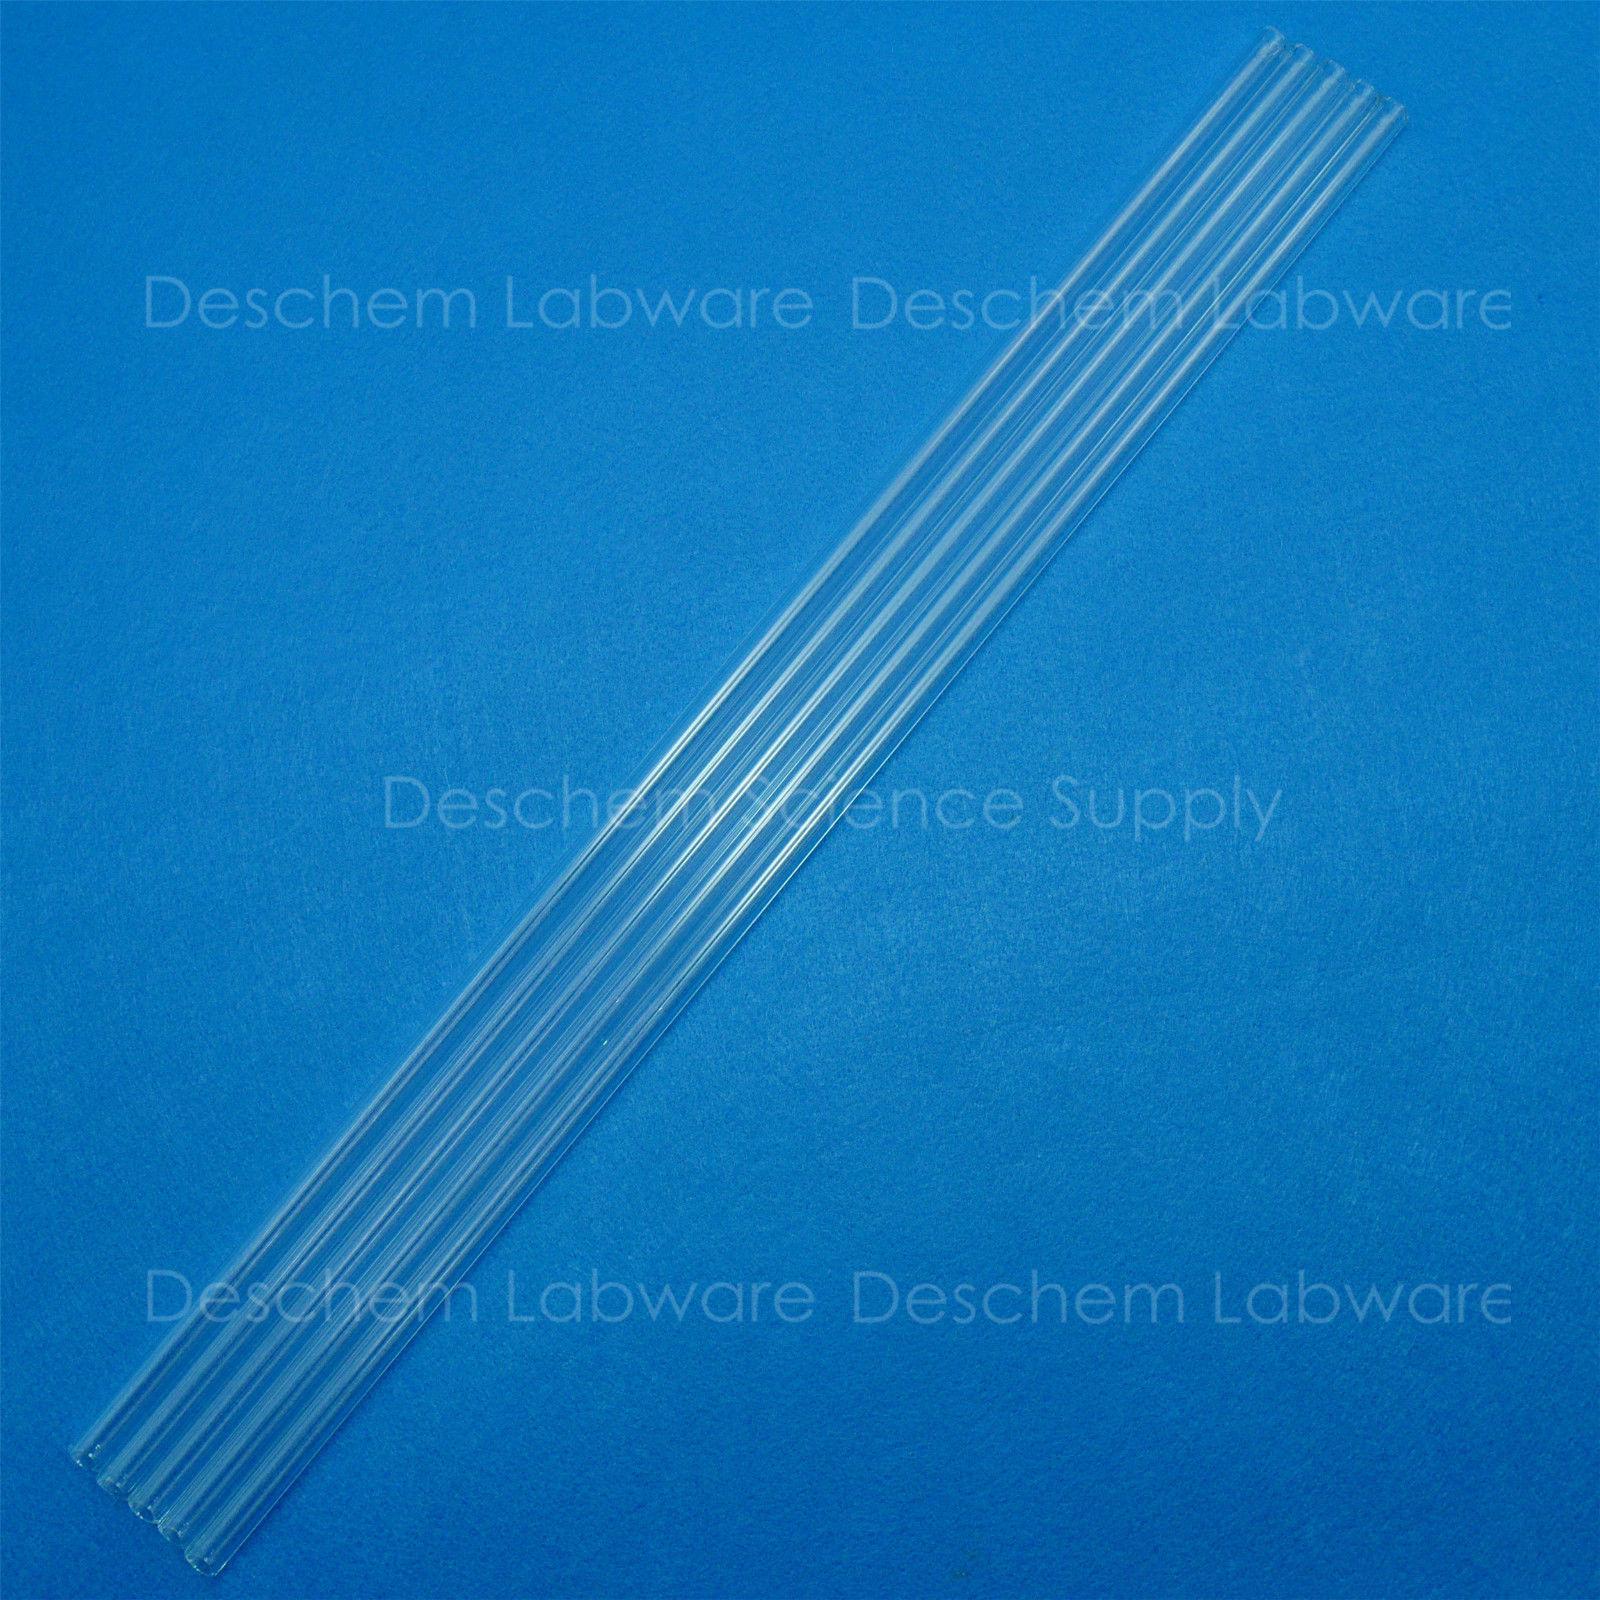 5PCS 300mm,Quartz Glass Tube,OD=10mm,Thcik=1.5mm,Made Form